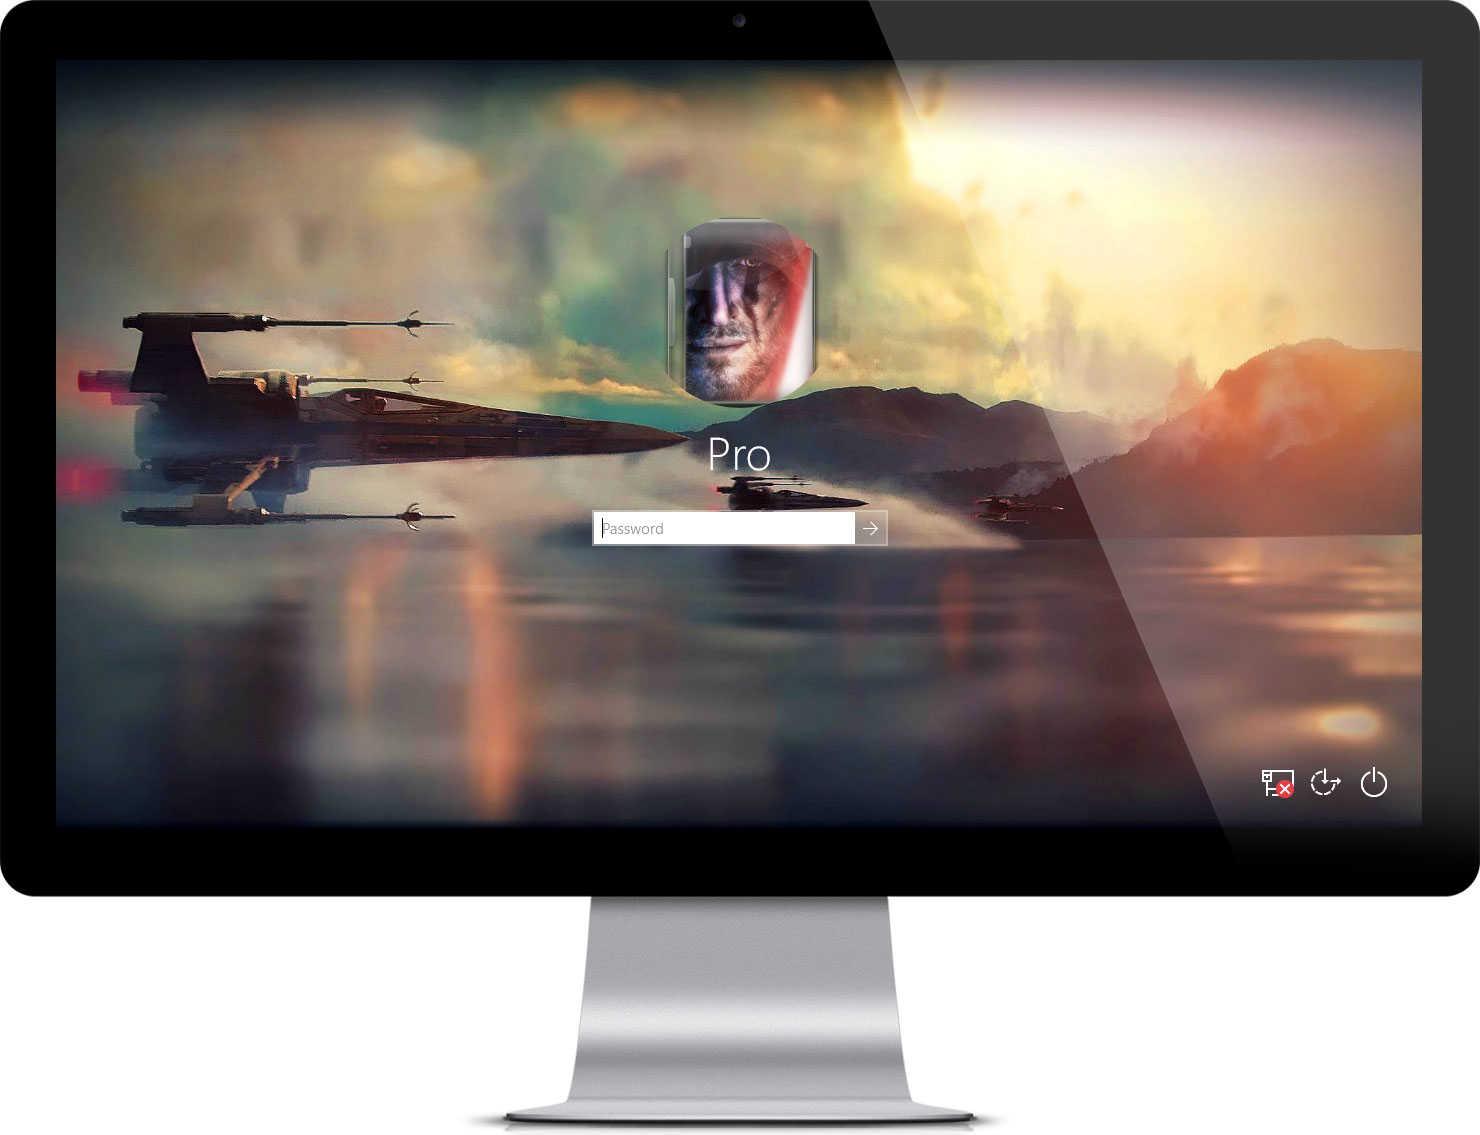 Star Wars The Force Awakens Theme on Windows 10 1480x1135